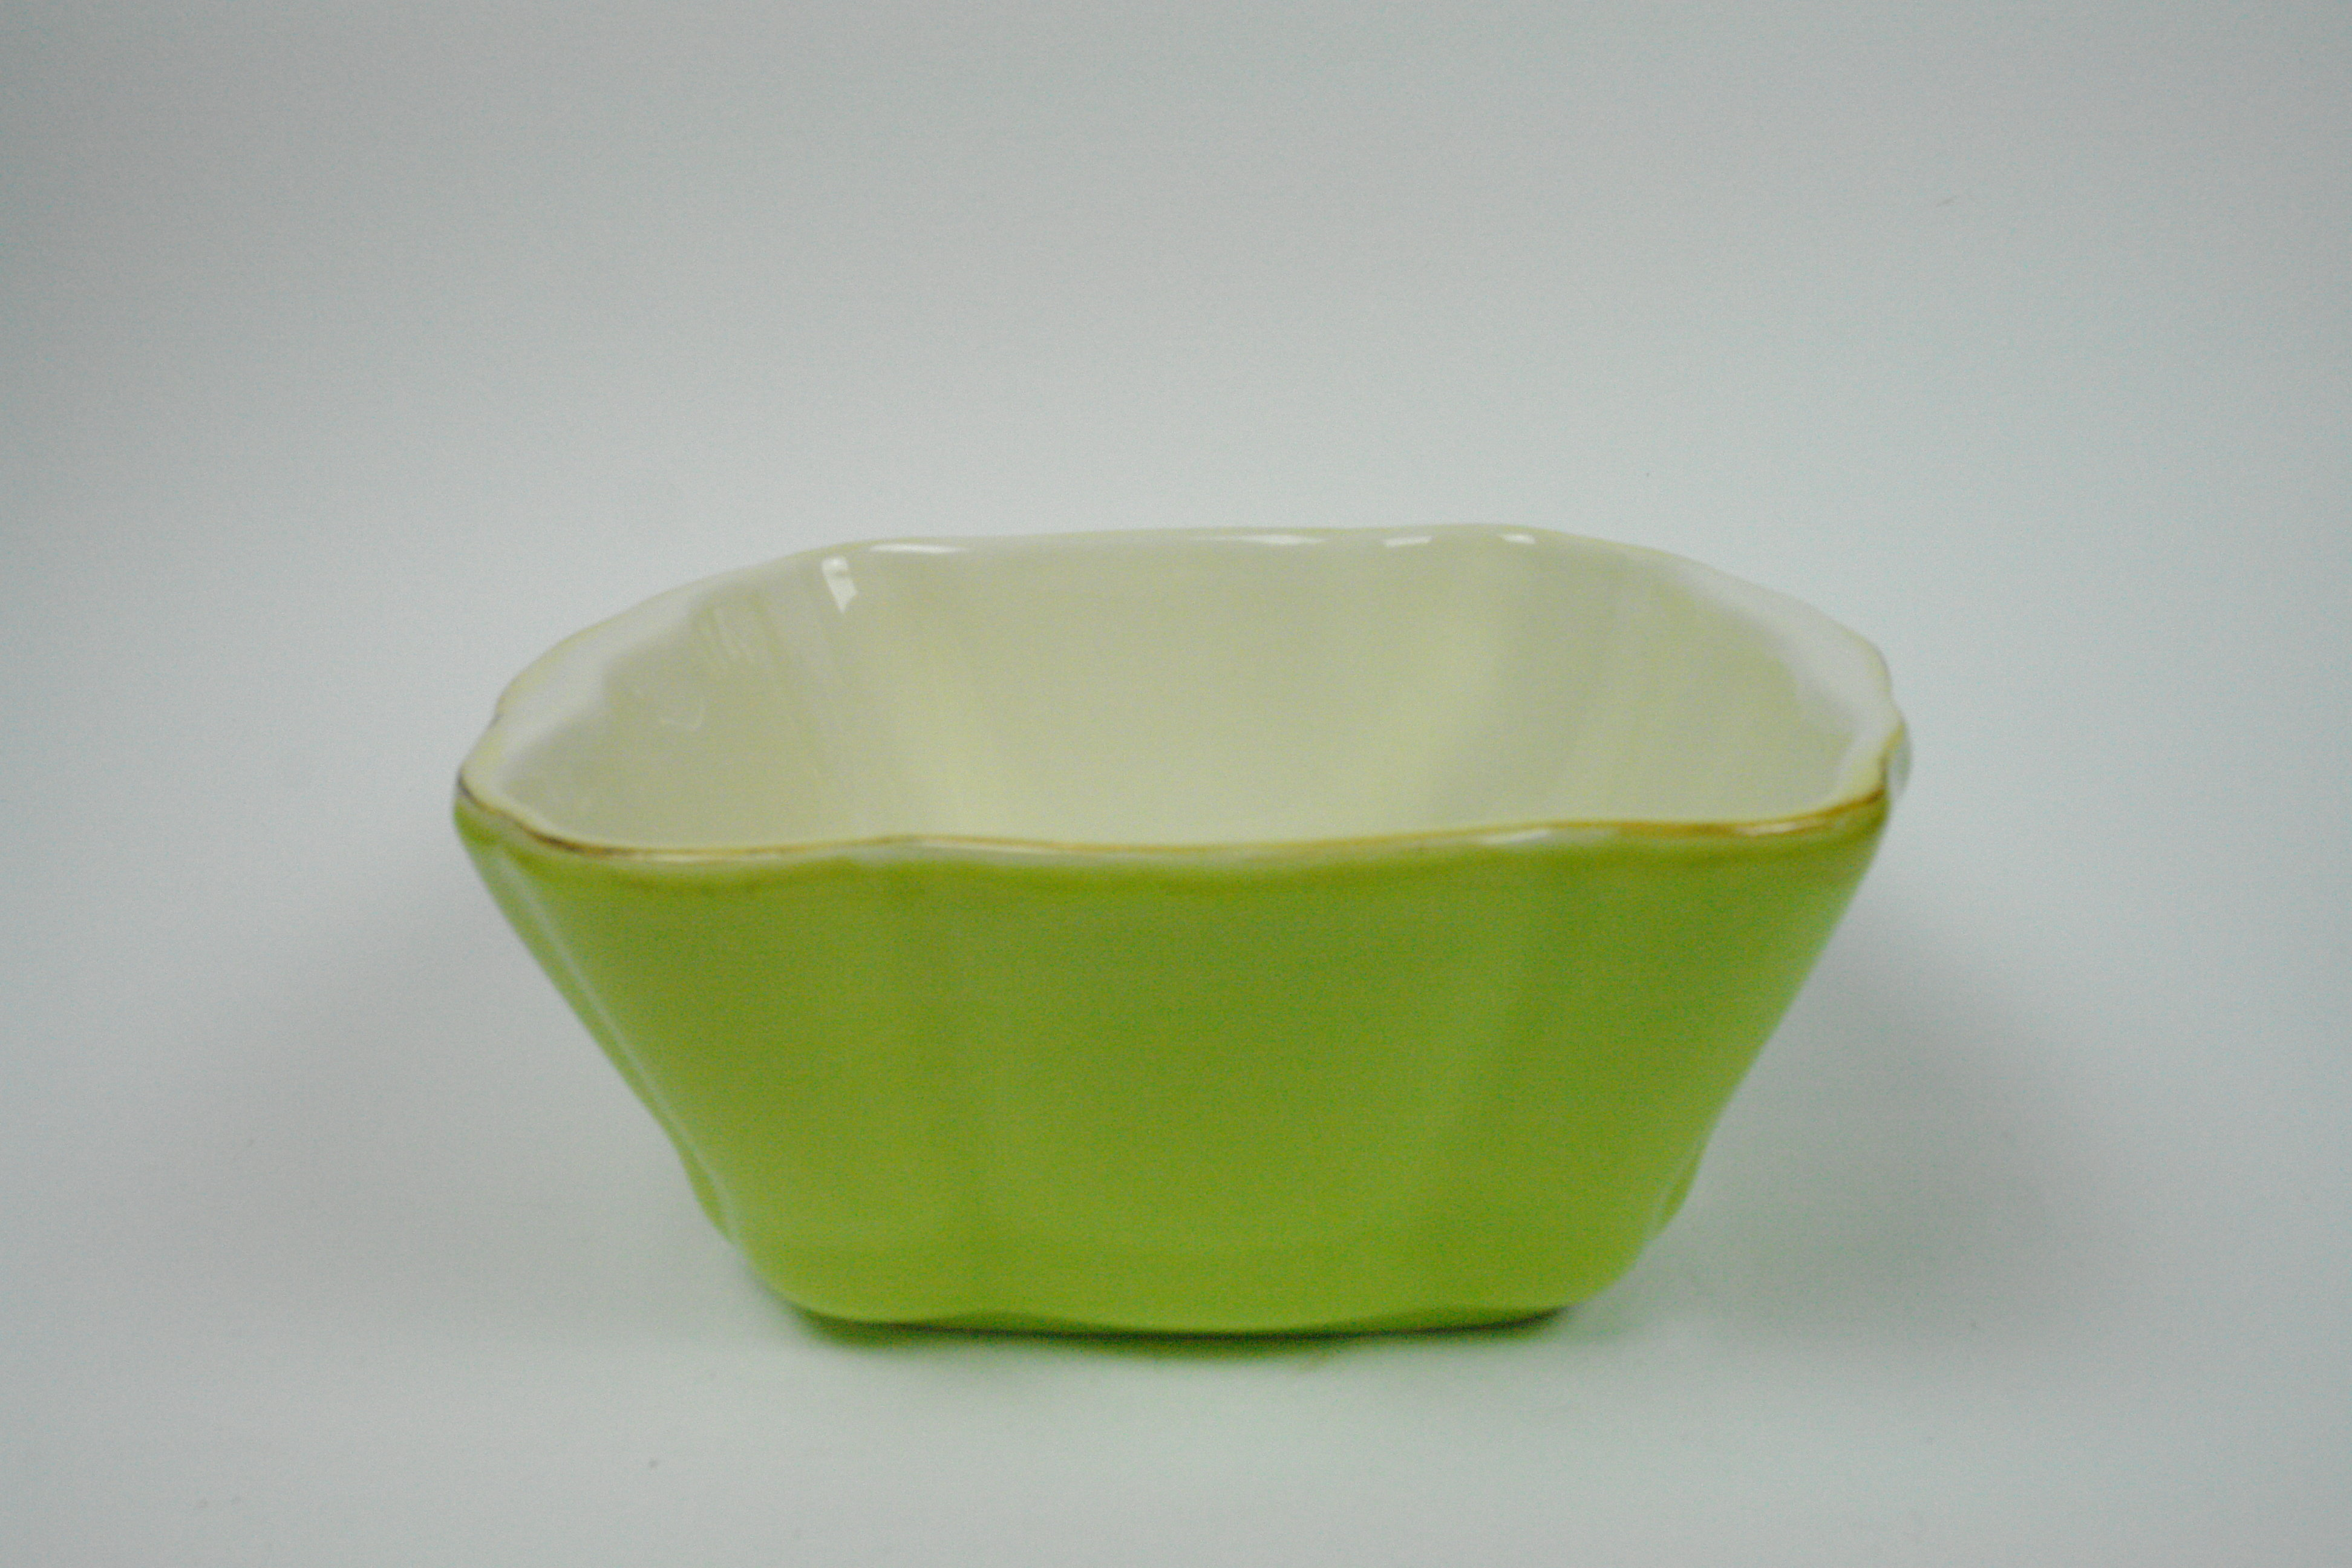 gr nbunte ital keramik auflaufformen raumausbeute italienische keramik gr n form. Black Bedroom Furniture Sets. Home Design Ideas